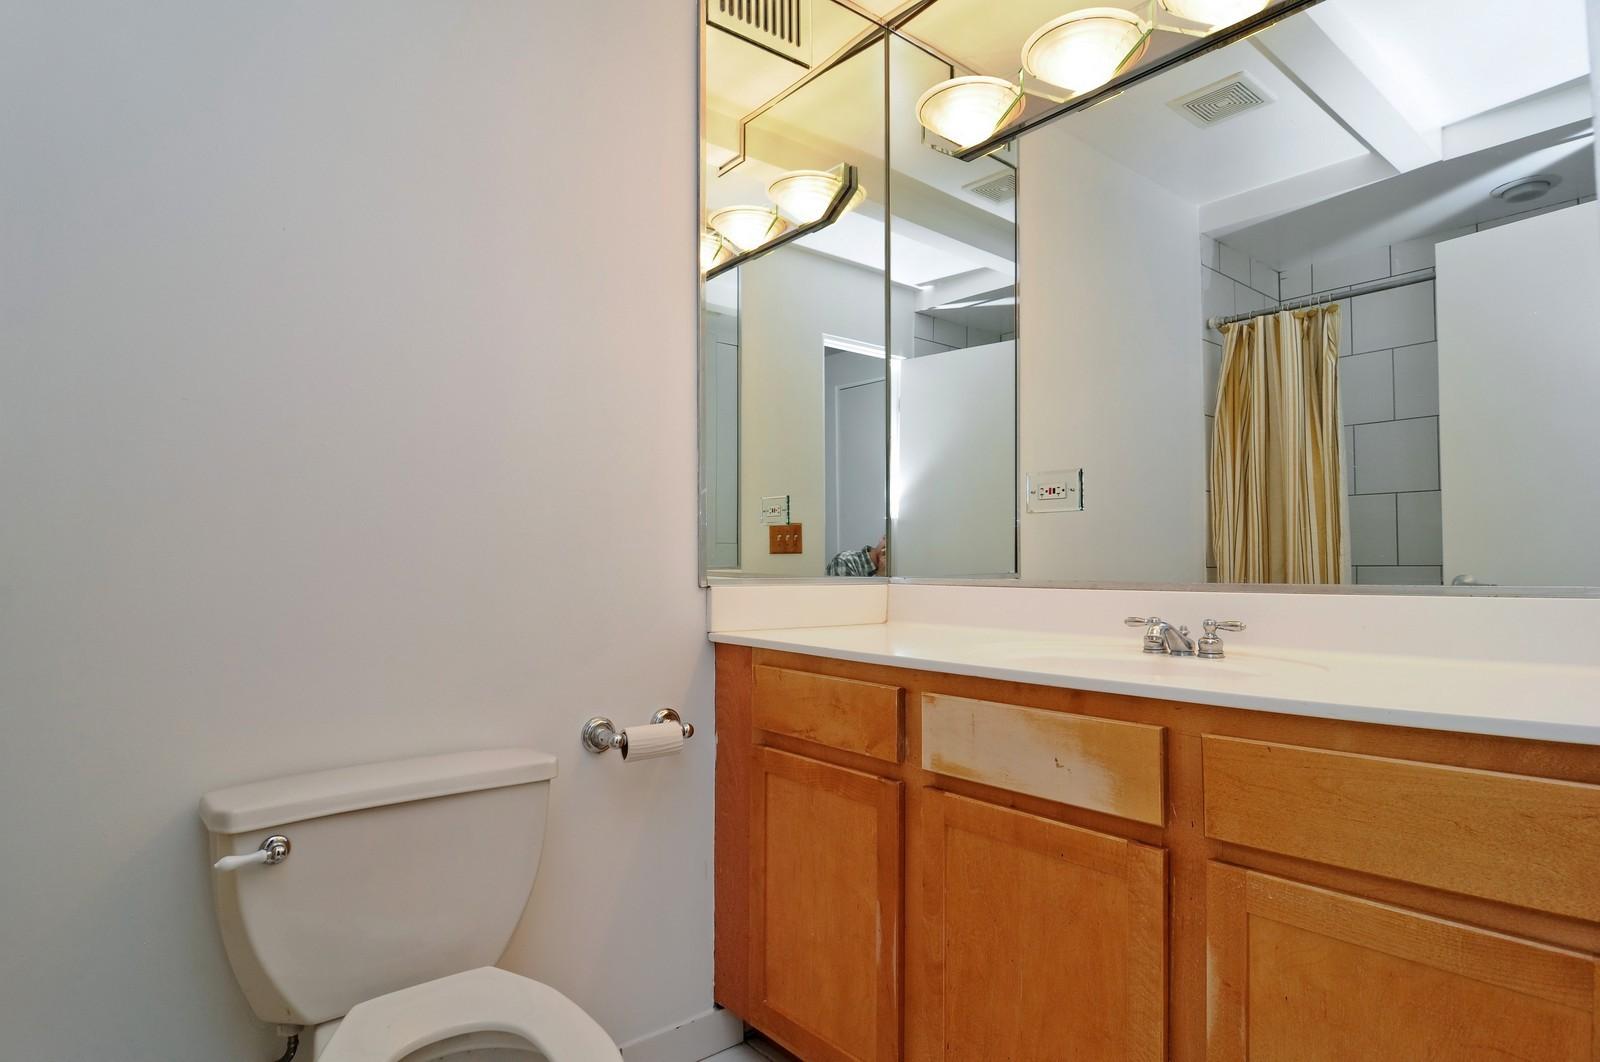 Real Estate Photography - 1528 S Wabash, Unit 509, Chicago, IL, 60605 - Bathroom